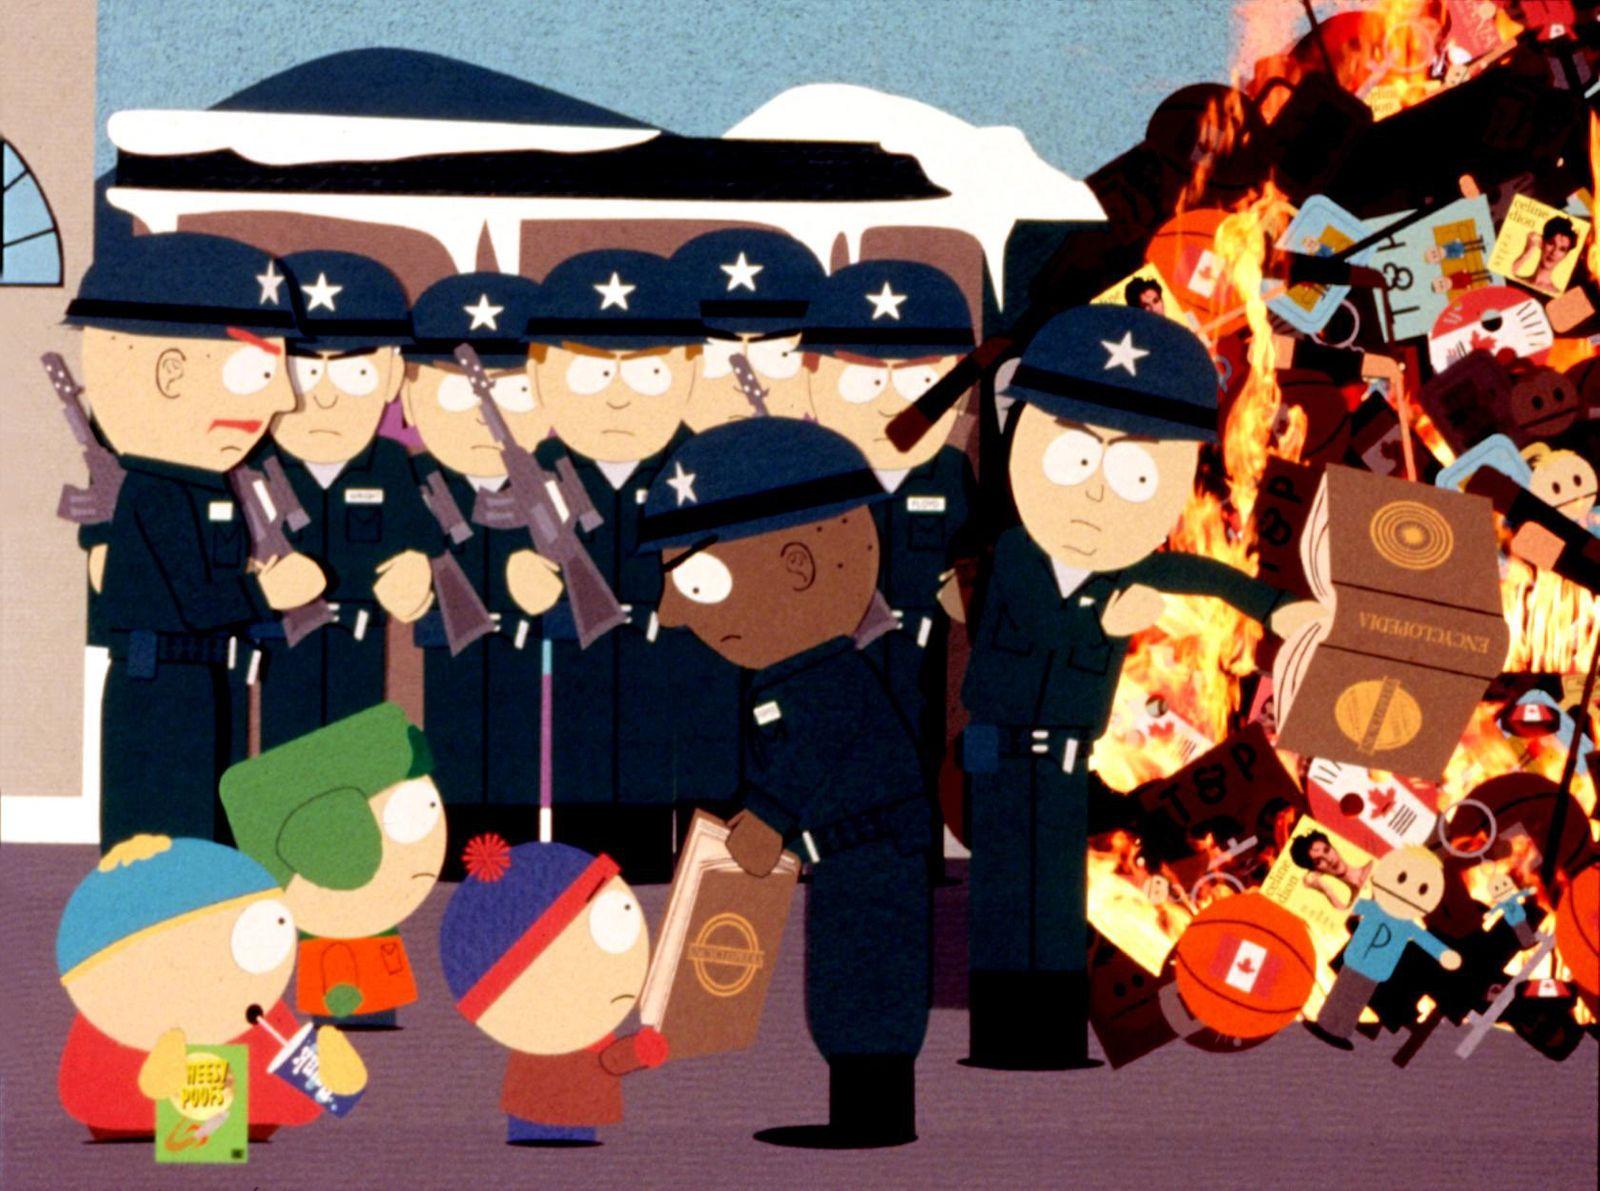 SOUTH PARK : BIGGER, LONGER & UNCUT, Cartman, Kyle, Stan, 1999